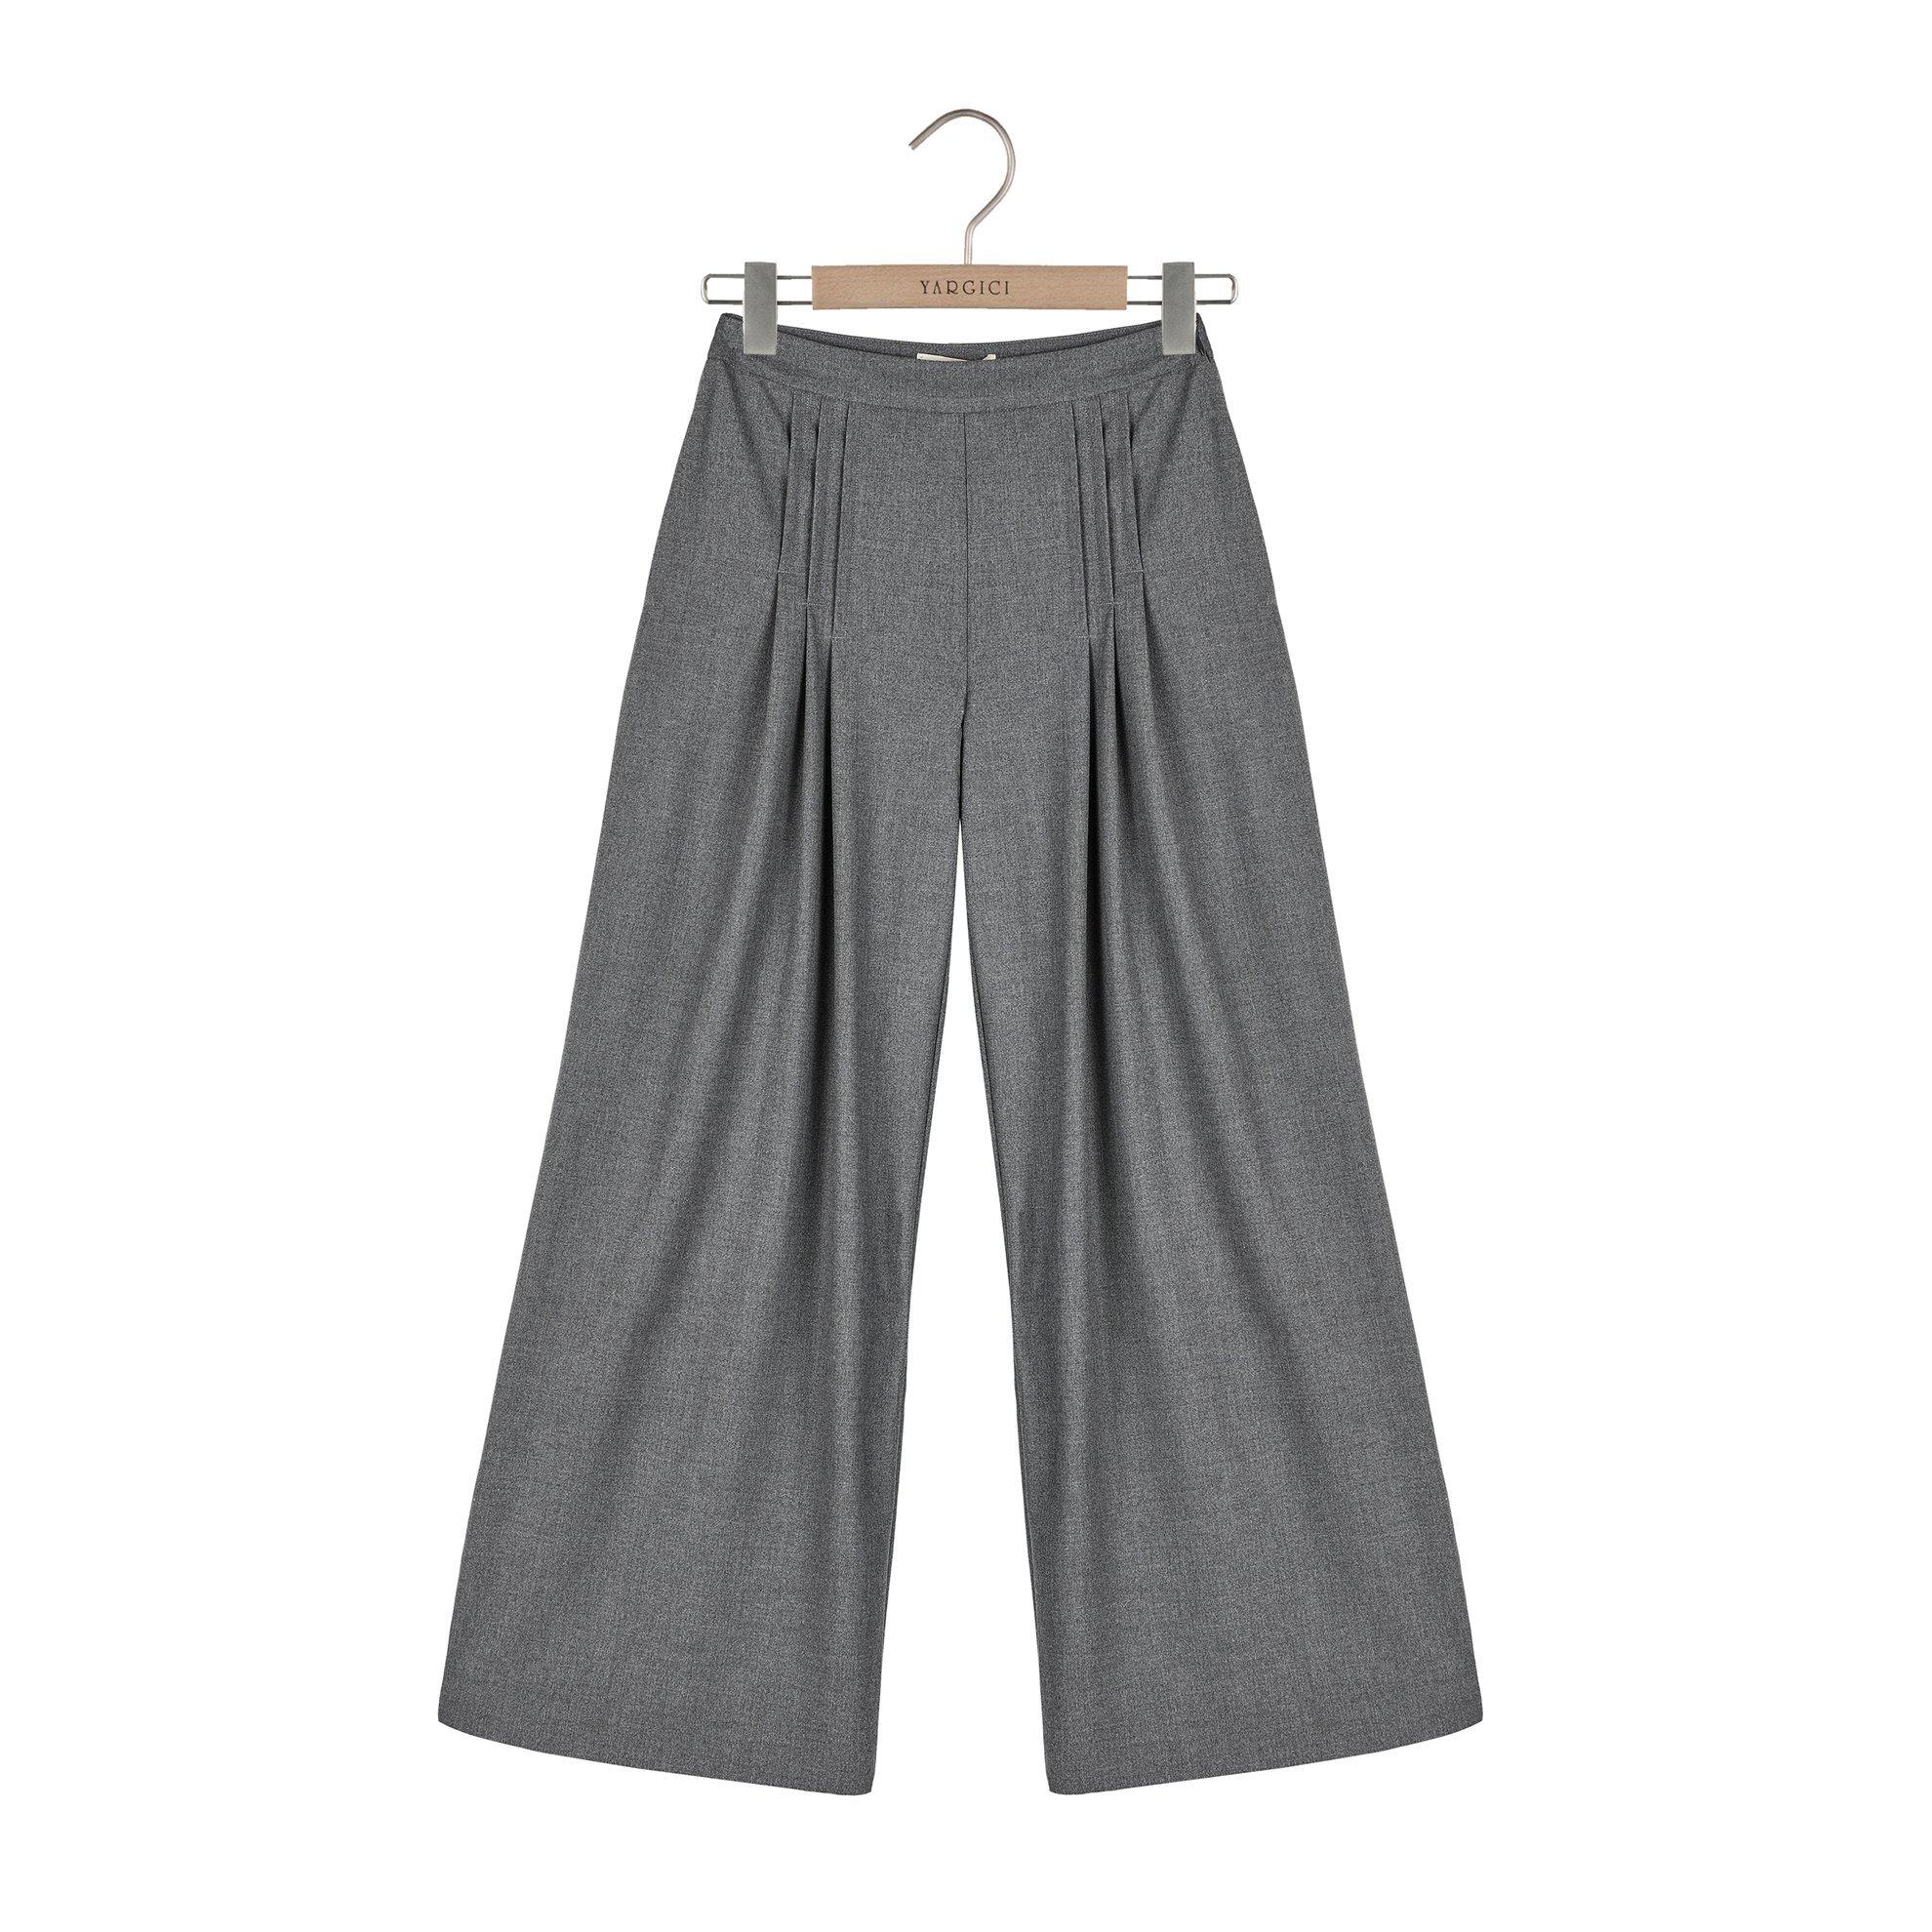 Nervür Detaylı Geniş Paça Pantolon